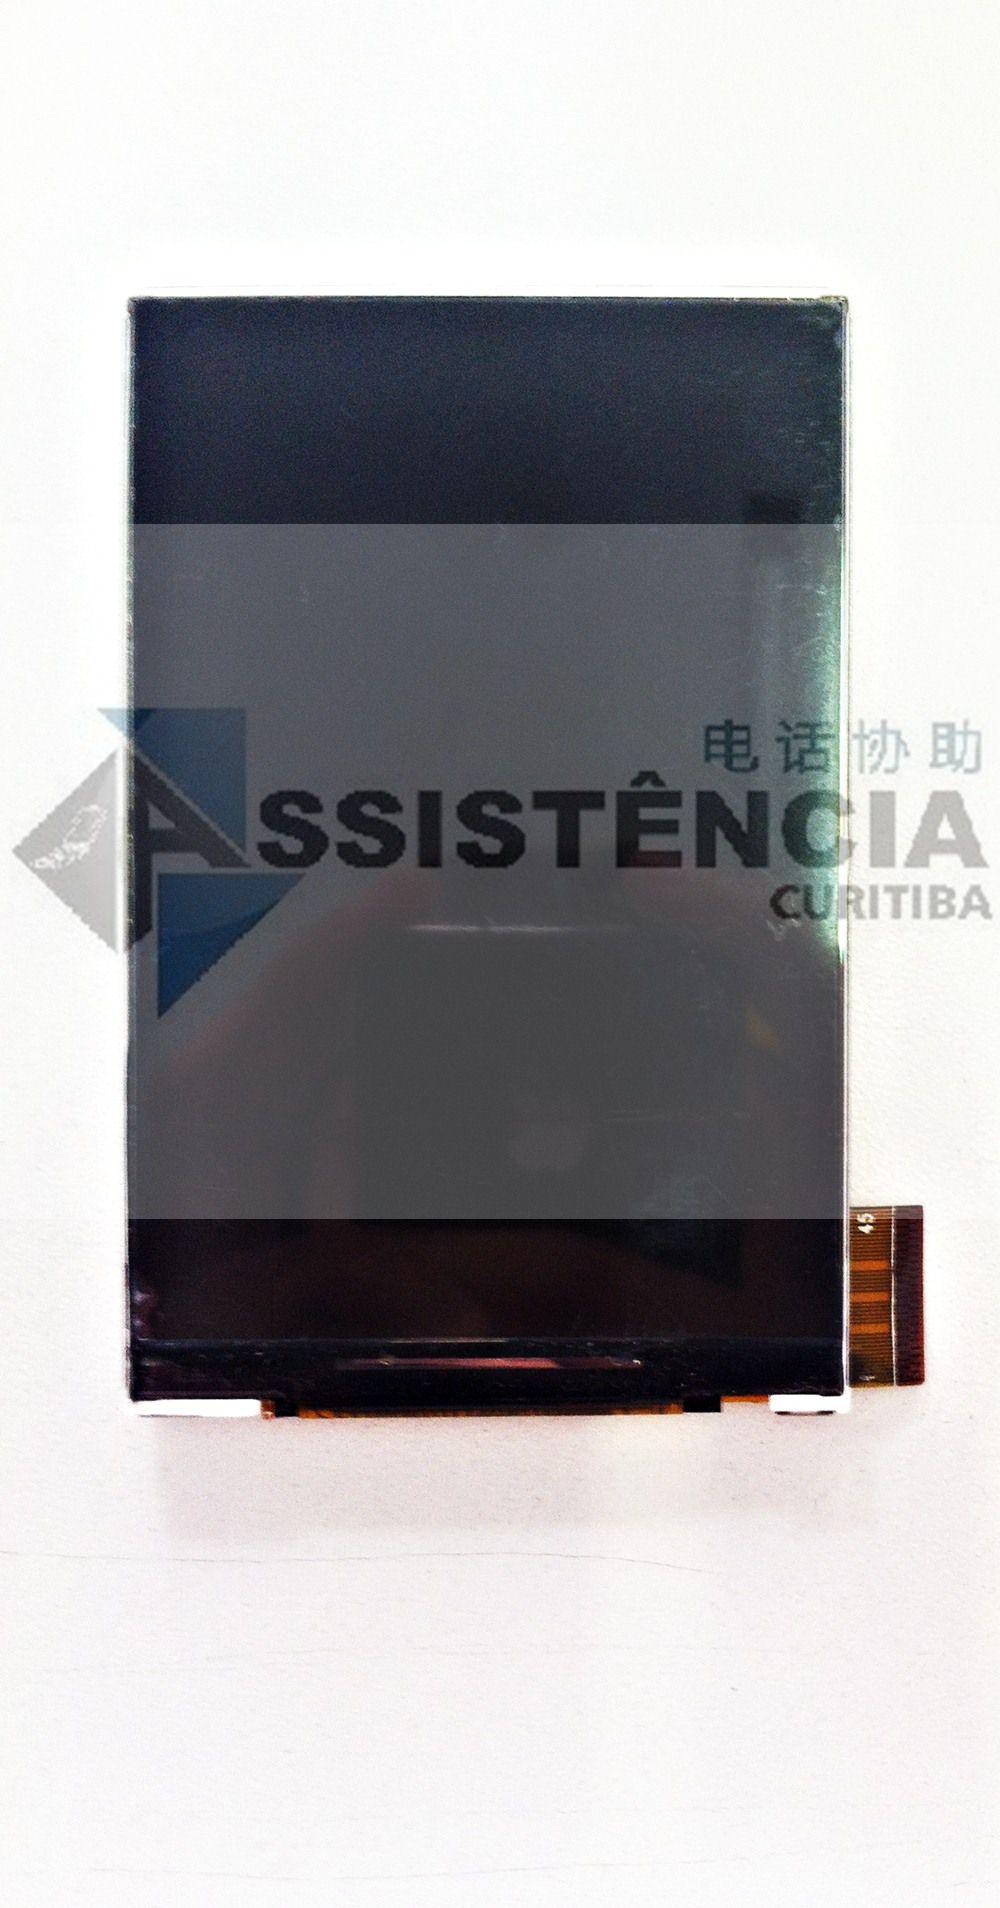 TELA DISPLAY LCD CELULAR GENESIS GP 351 GP351